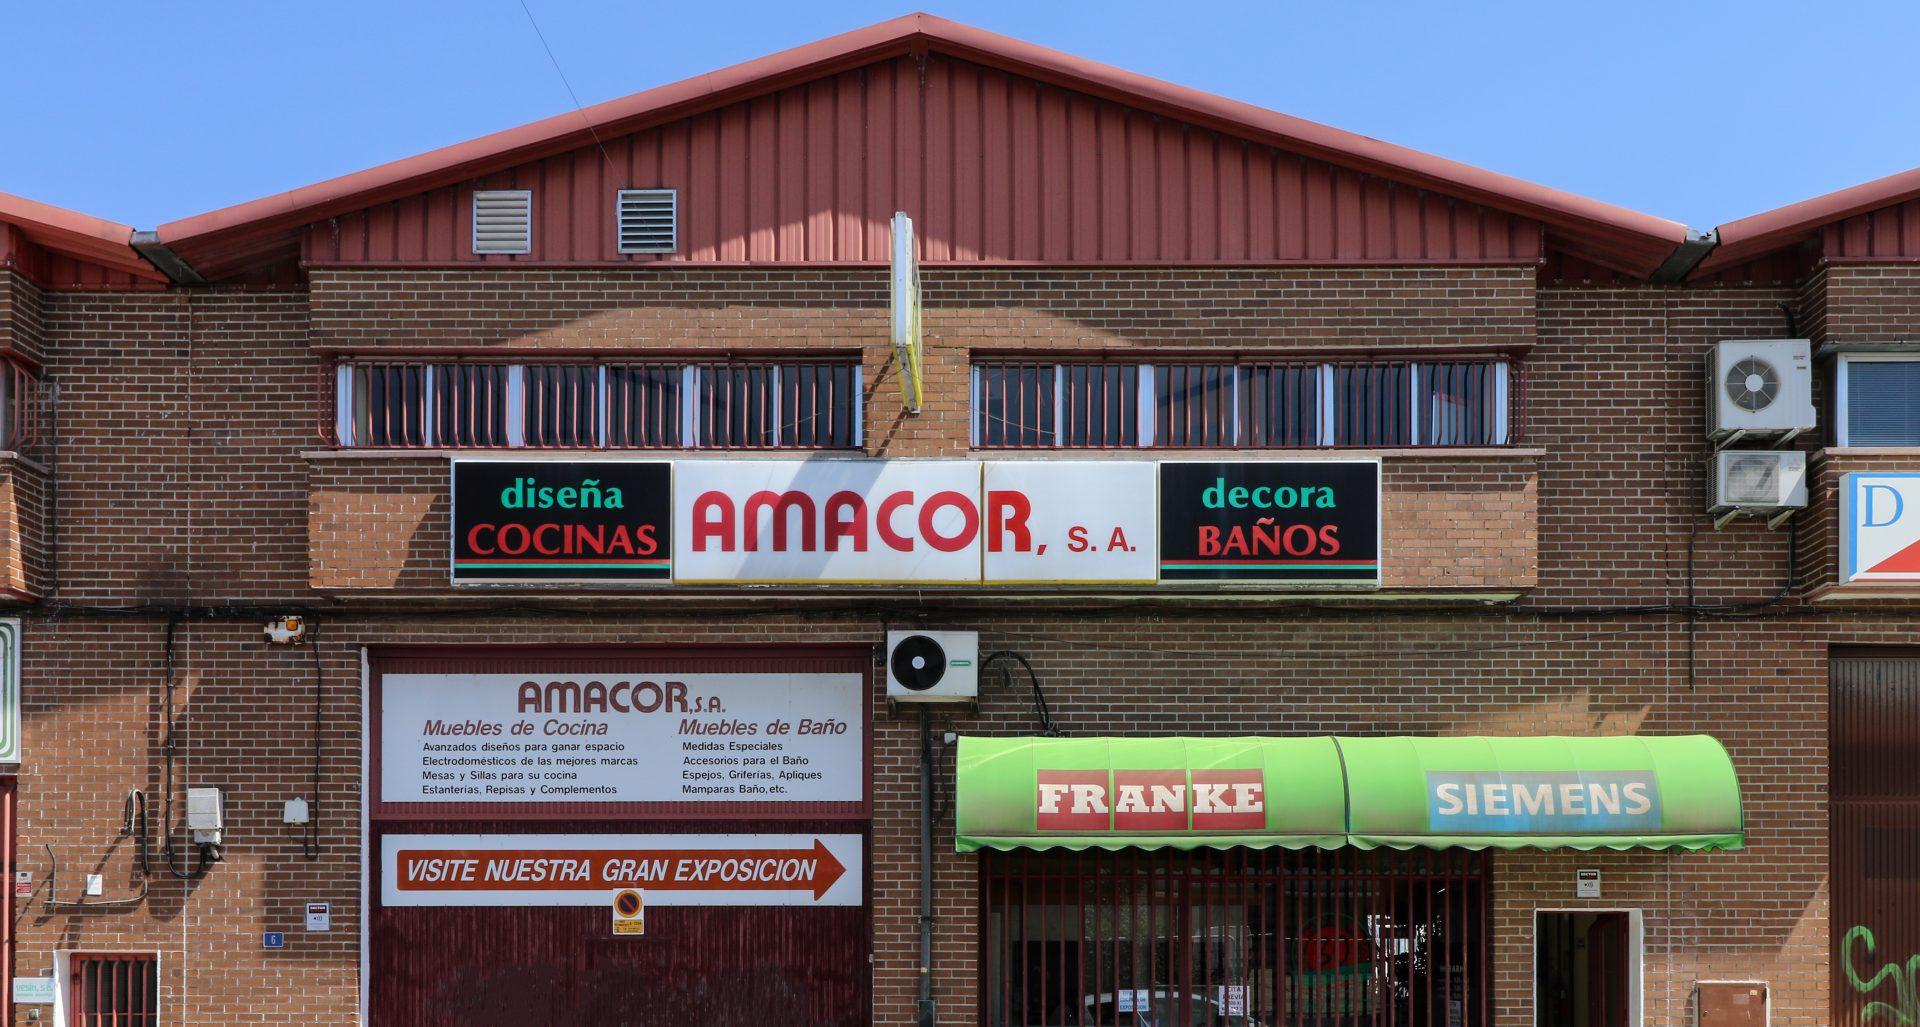 Amacor SA